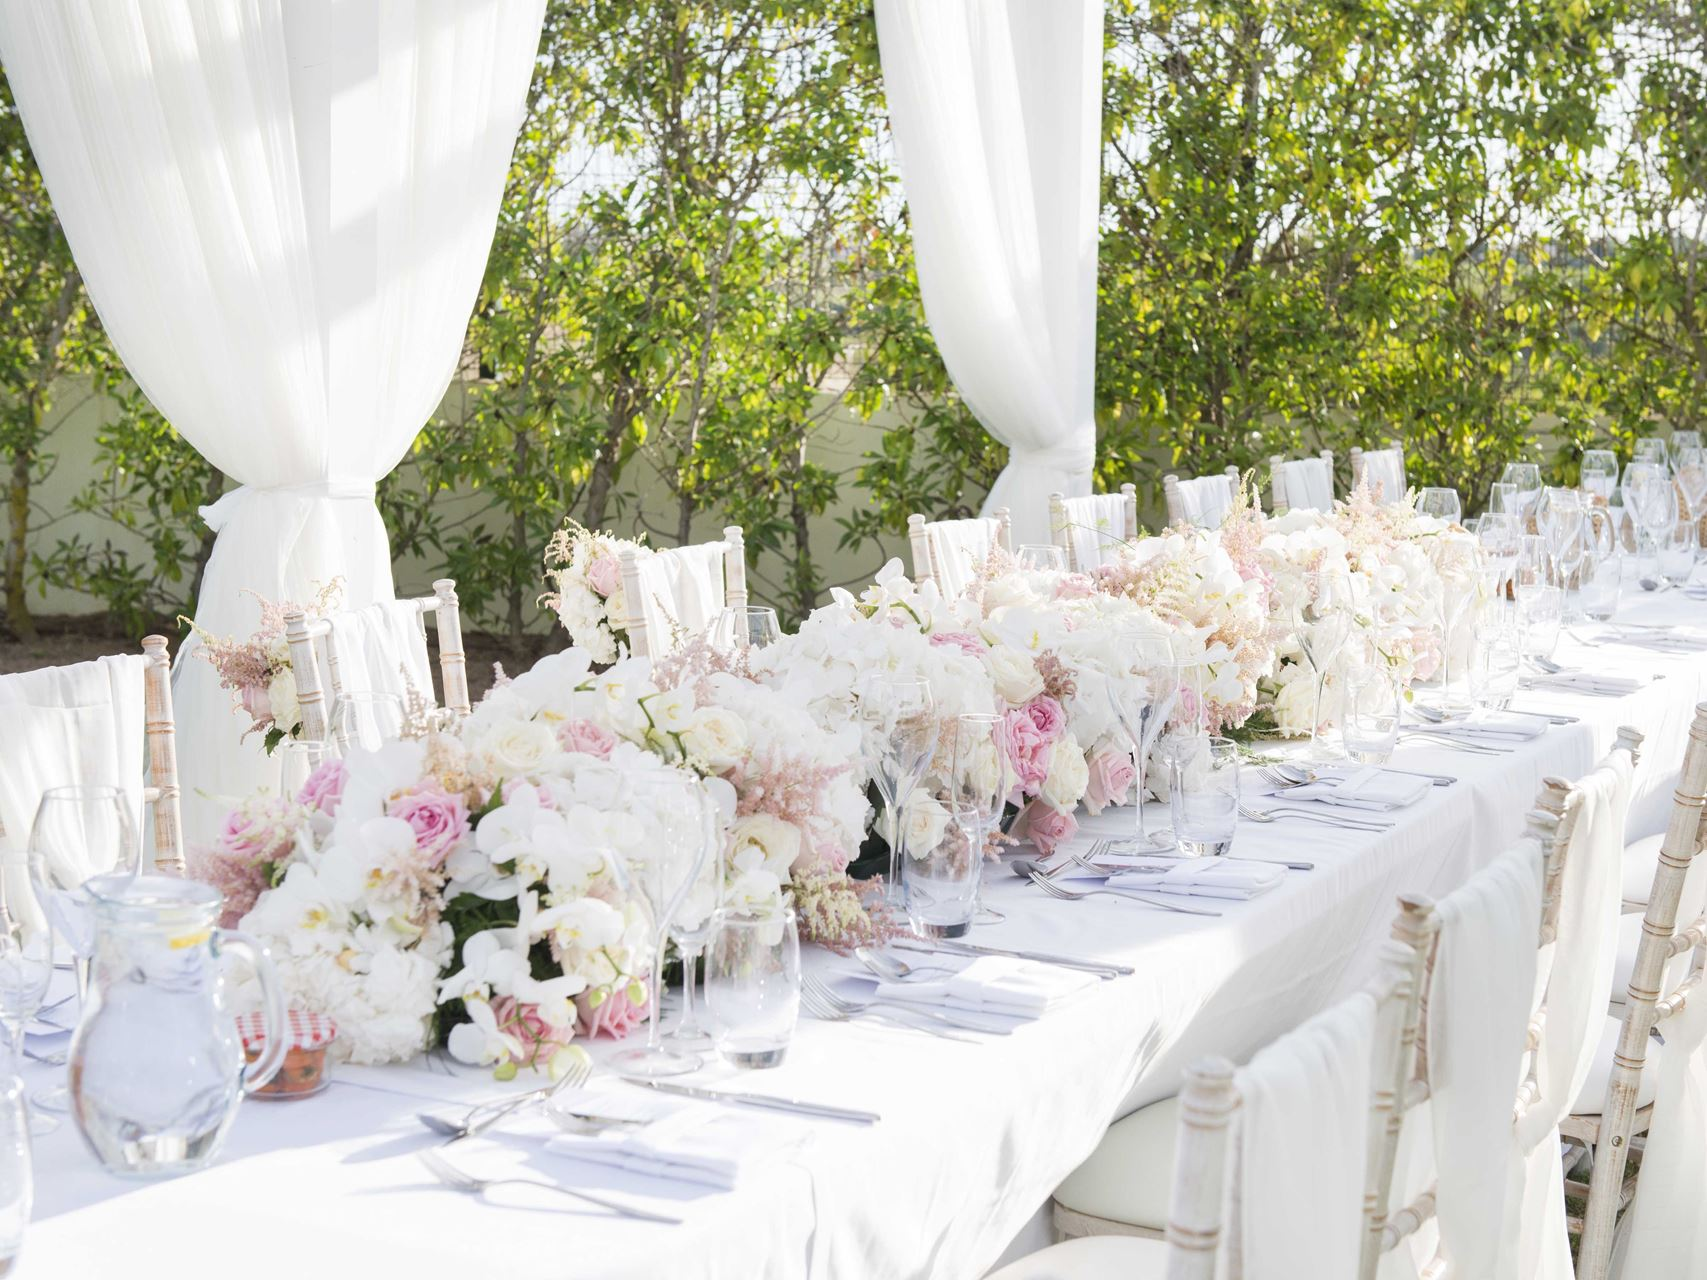 Olivia & Phil - Rebecca Woodhall Wedding Planner, Designer and ...